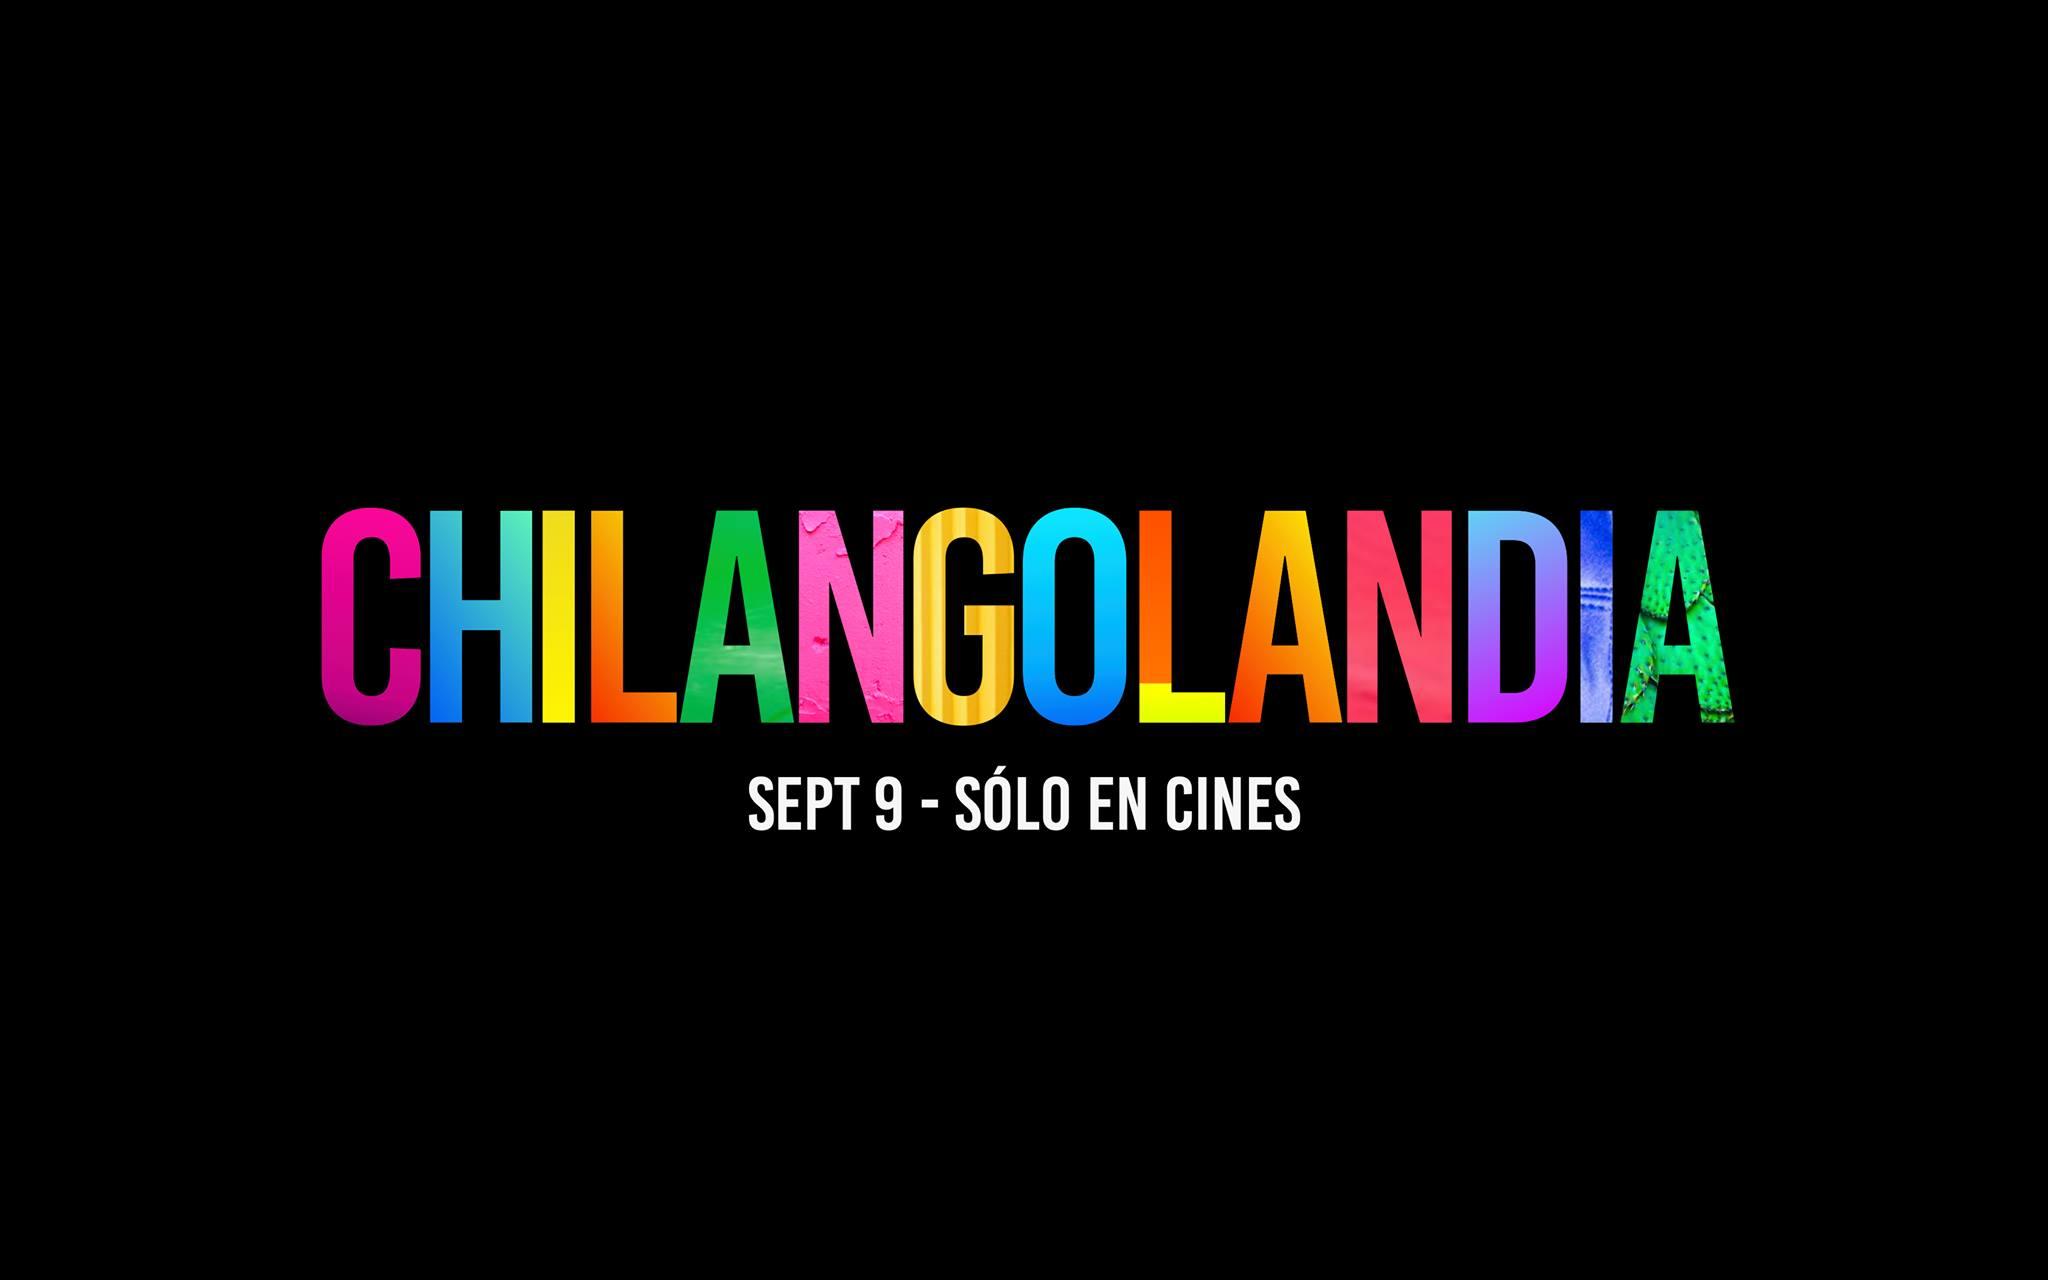 """Chilangolandia"", la ópera prima de Carlos Santos, se estrena a nivel nacional el 9 de septiembre"